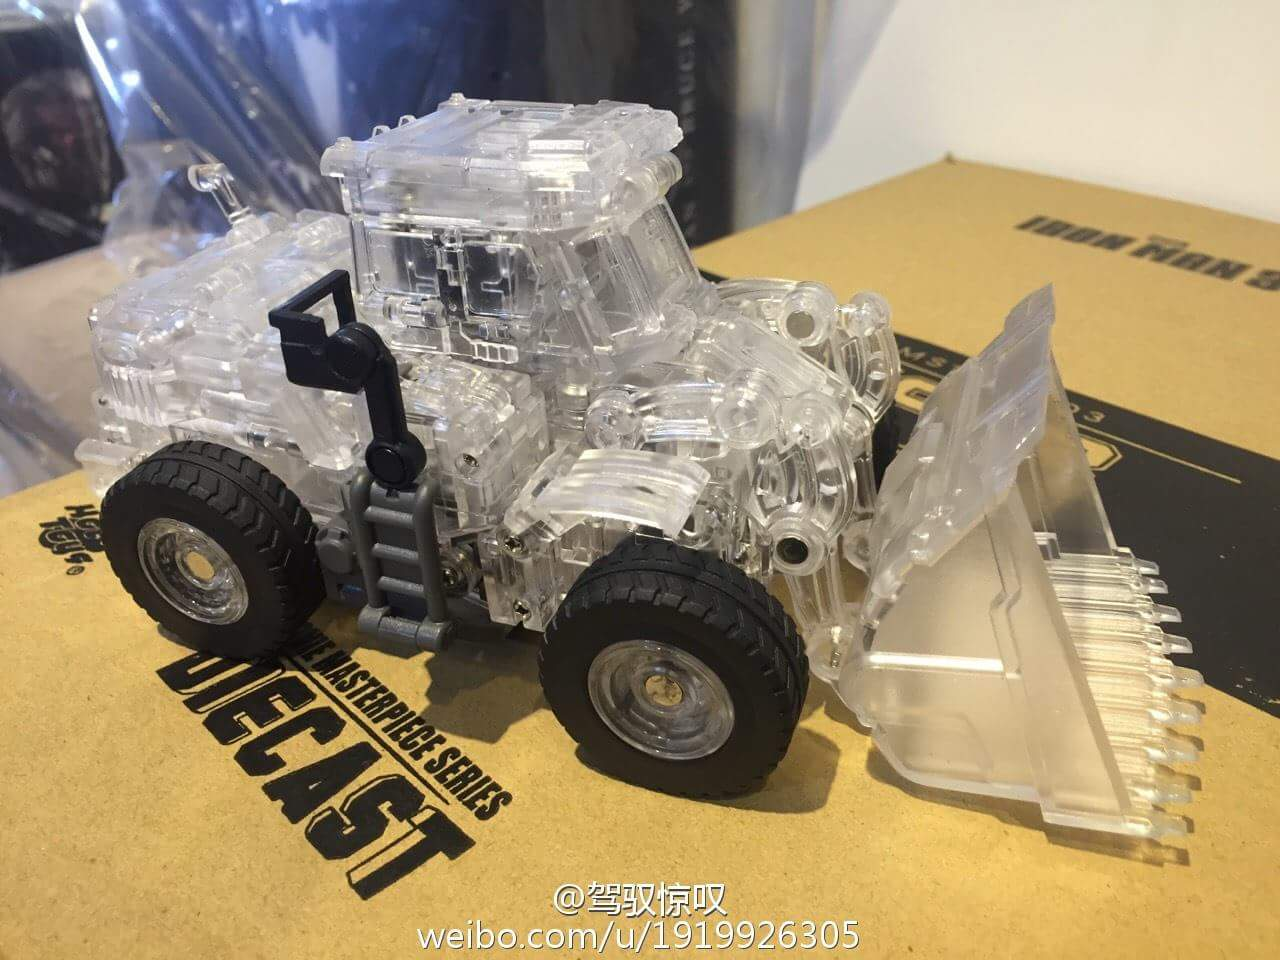 [Generation Toy] Produit Tiers - Jouet GT-01 Gravity Builder - aka Devastator/Dévastateur - Page 4 Dkj10vuW